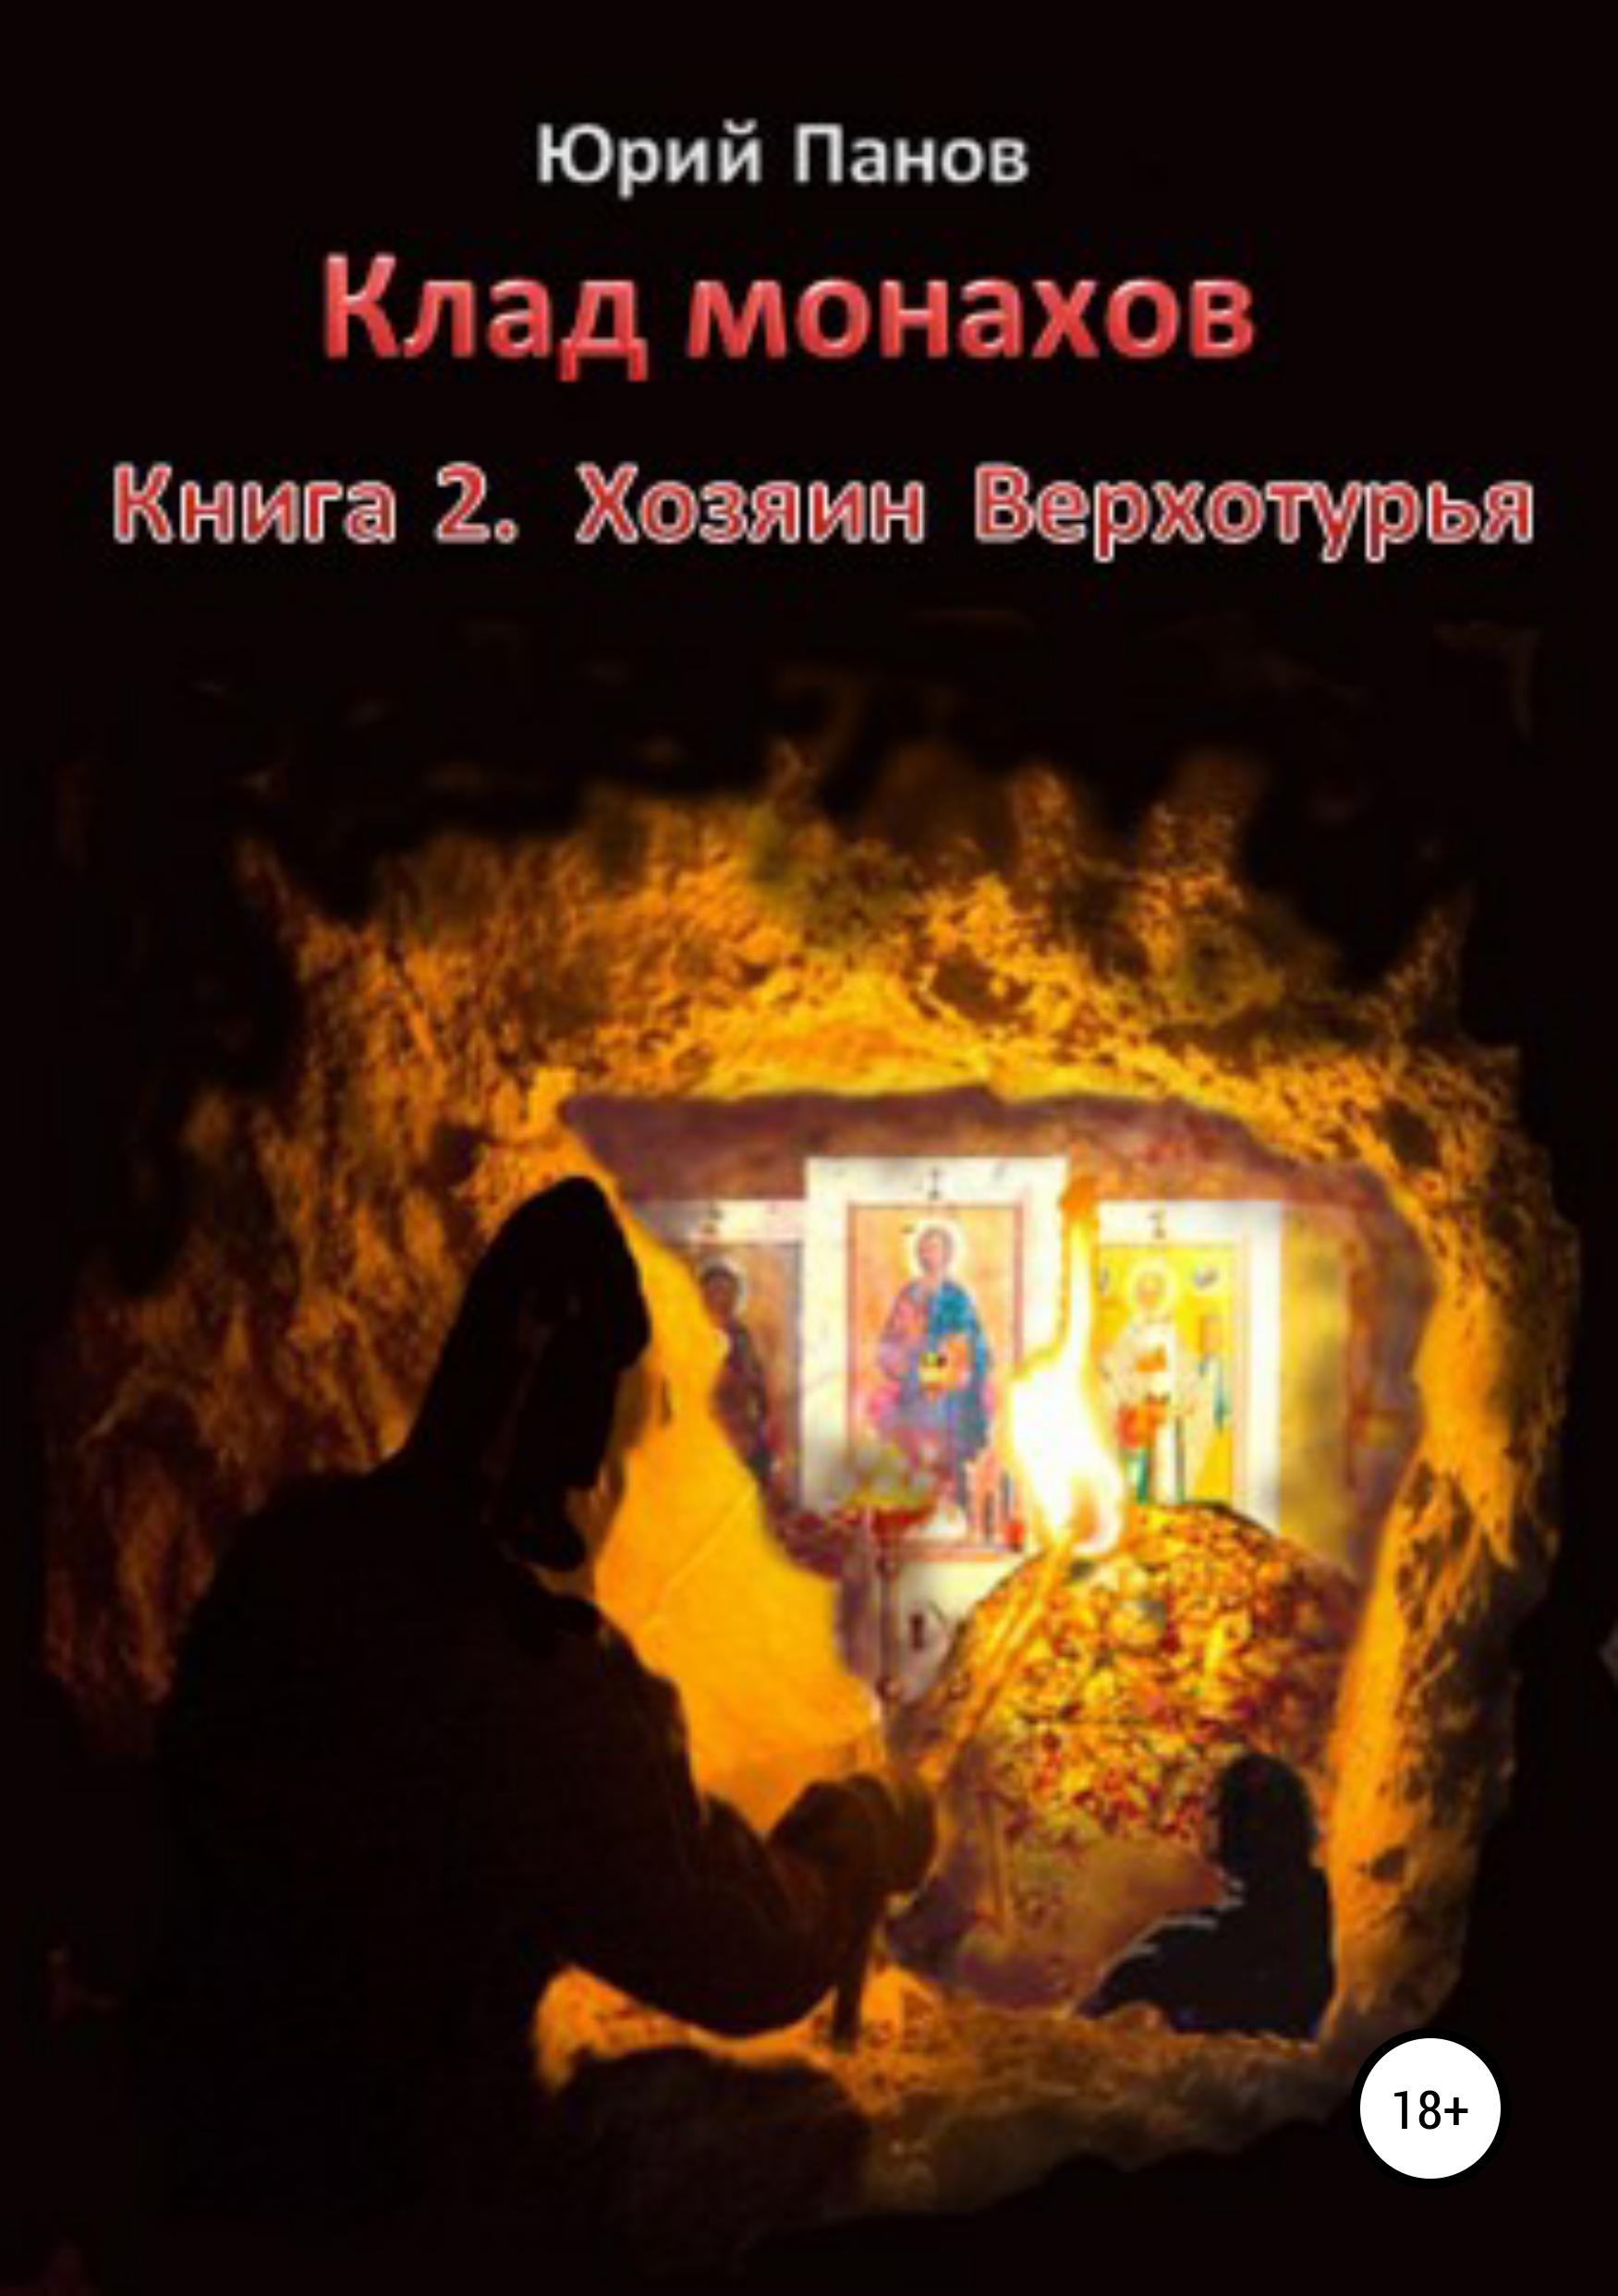 Купить книгу Клад монахов. Книга 2. Хозяин Верхотурья, автора Юрия Глебовича Панова